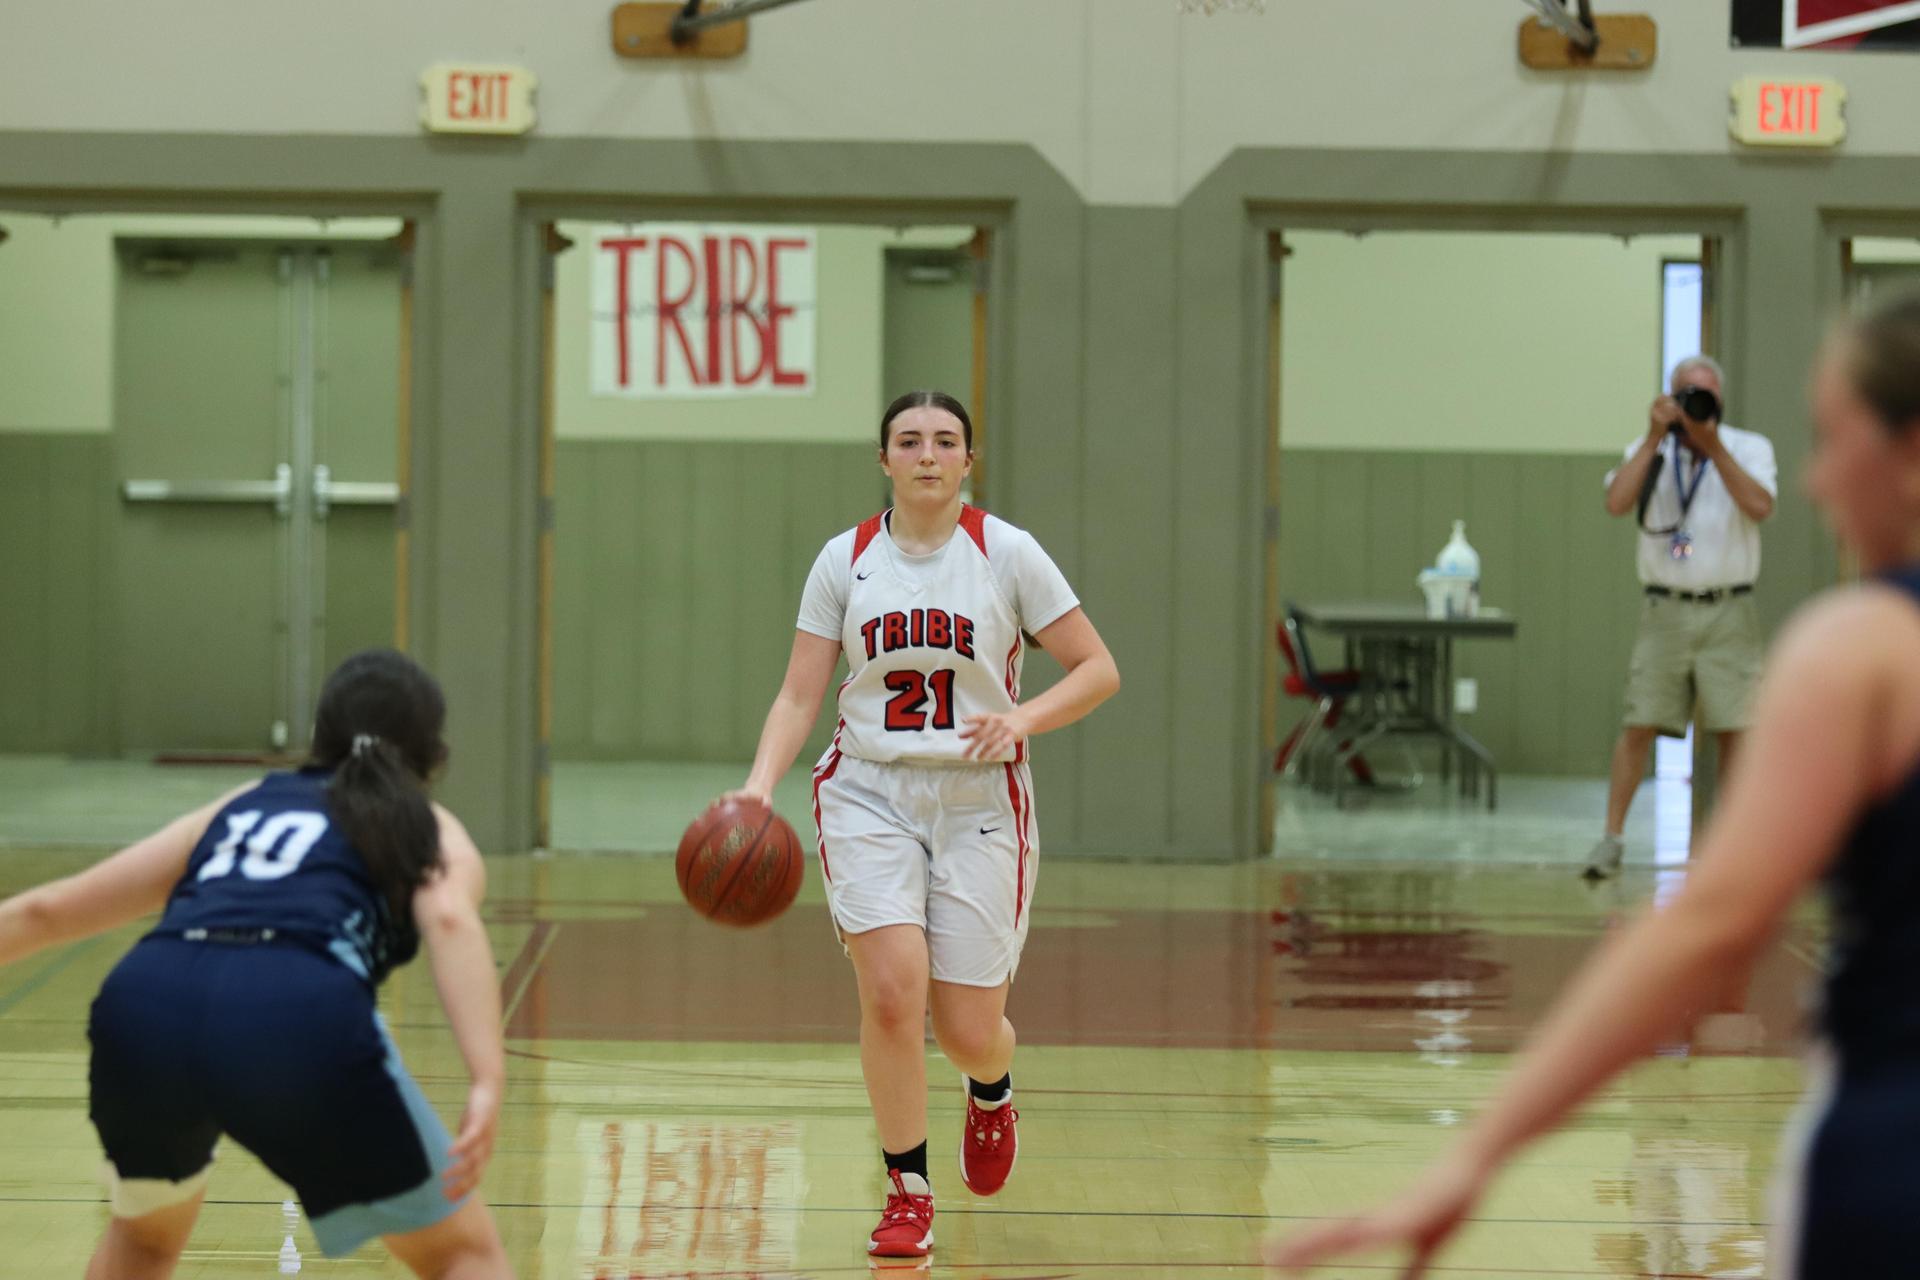 Girl's Basketball playing against Yosemite